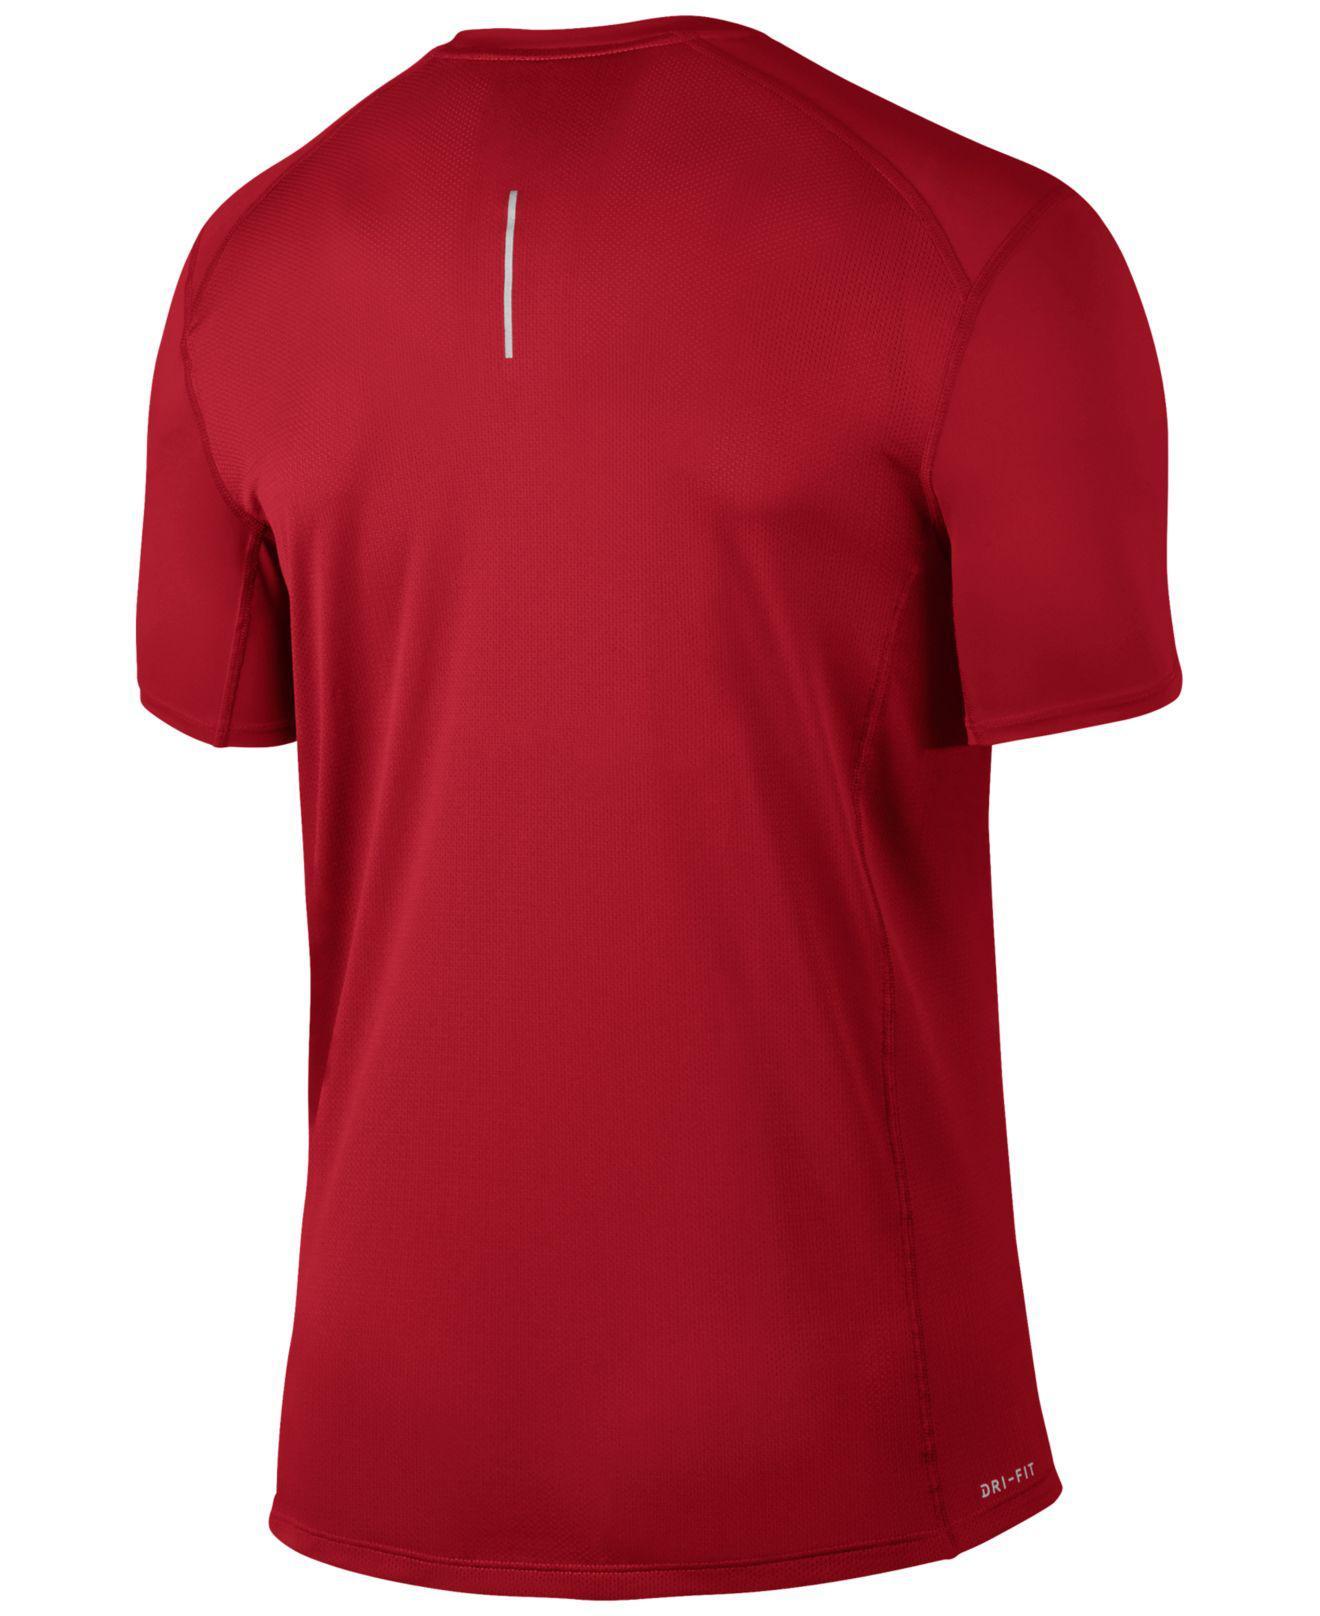 3c9e8204243a Lyst - Nike Dry Miler Running T-shirt in Red for Men